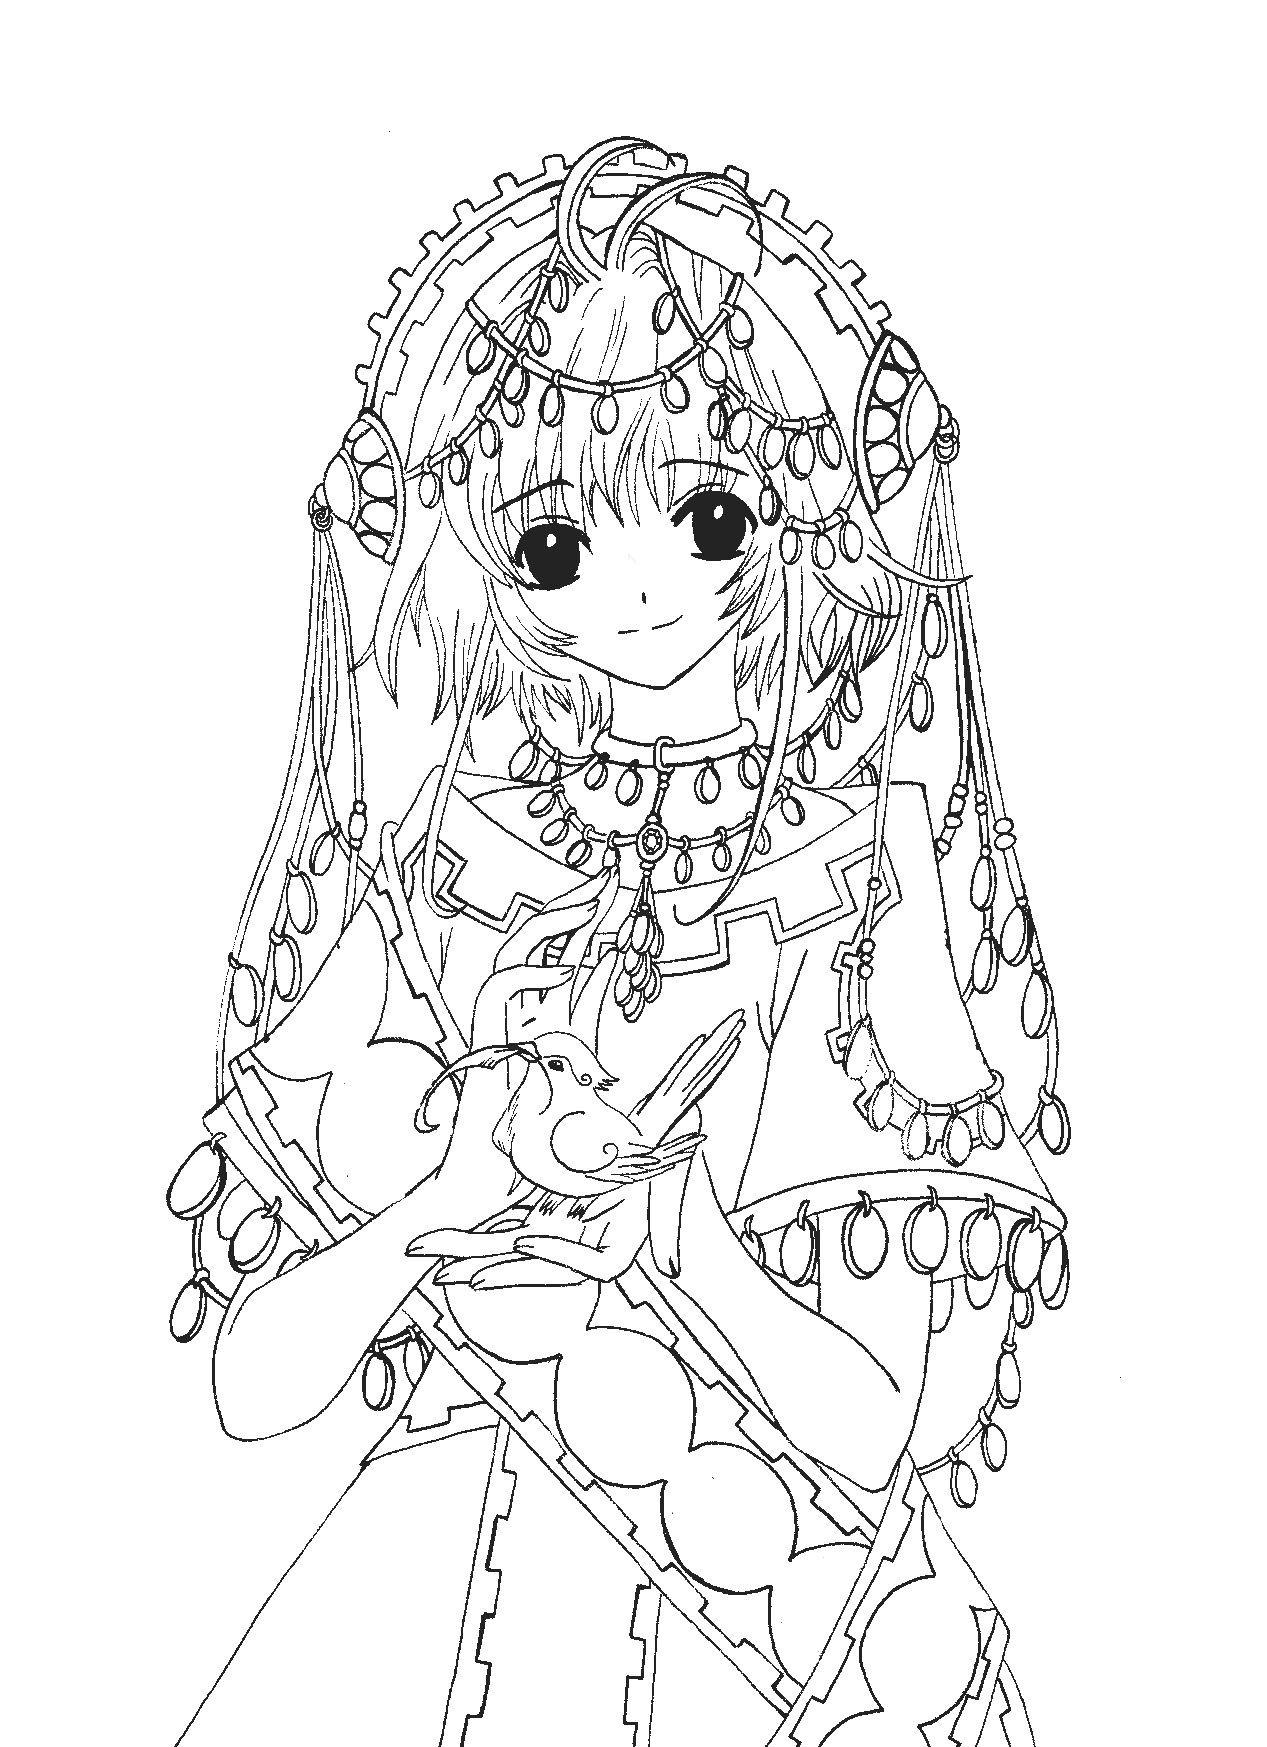 Sakura Tsubasa Chronicles Mermaid Coloring Pages Coloring Pages Tsubasa Chronicles [ 1747 x 1267 Pixel ]